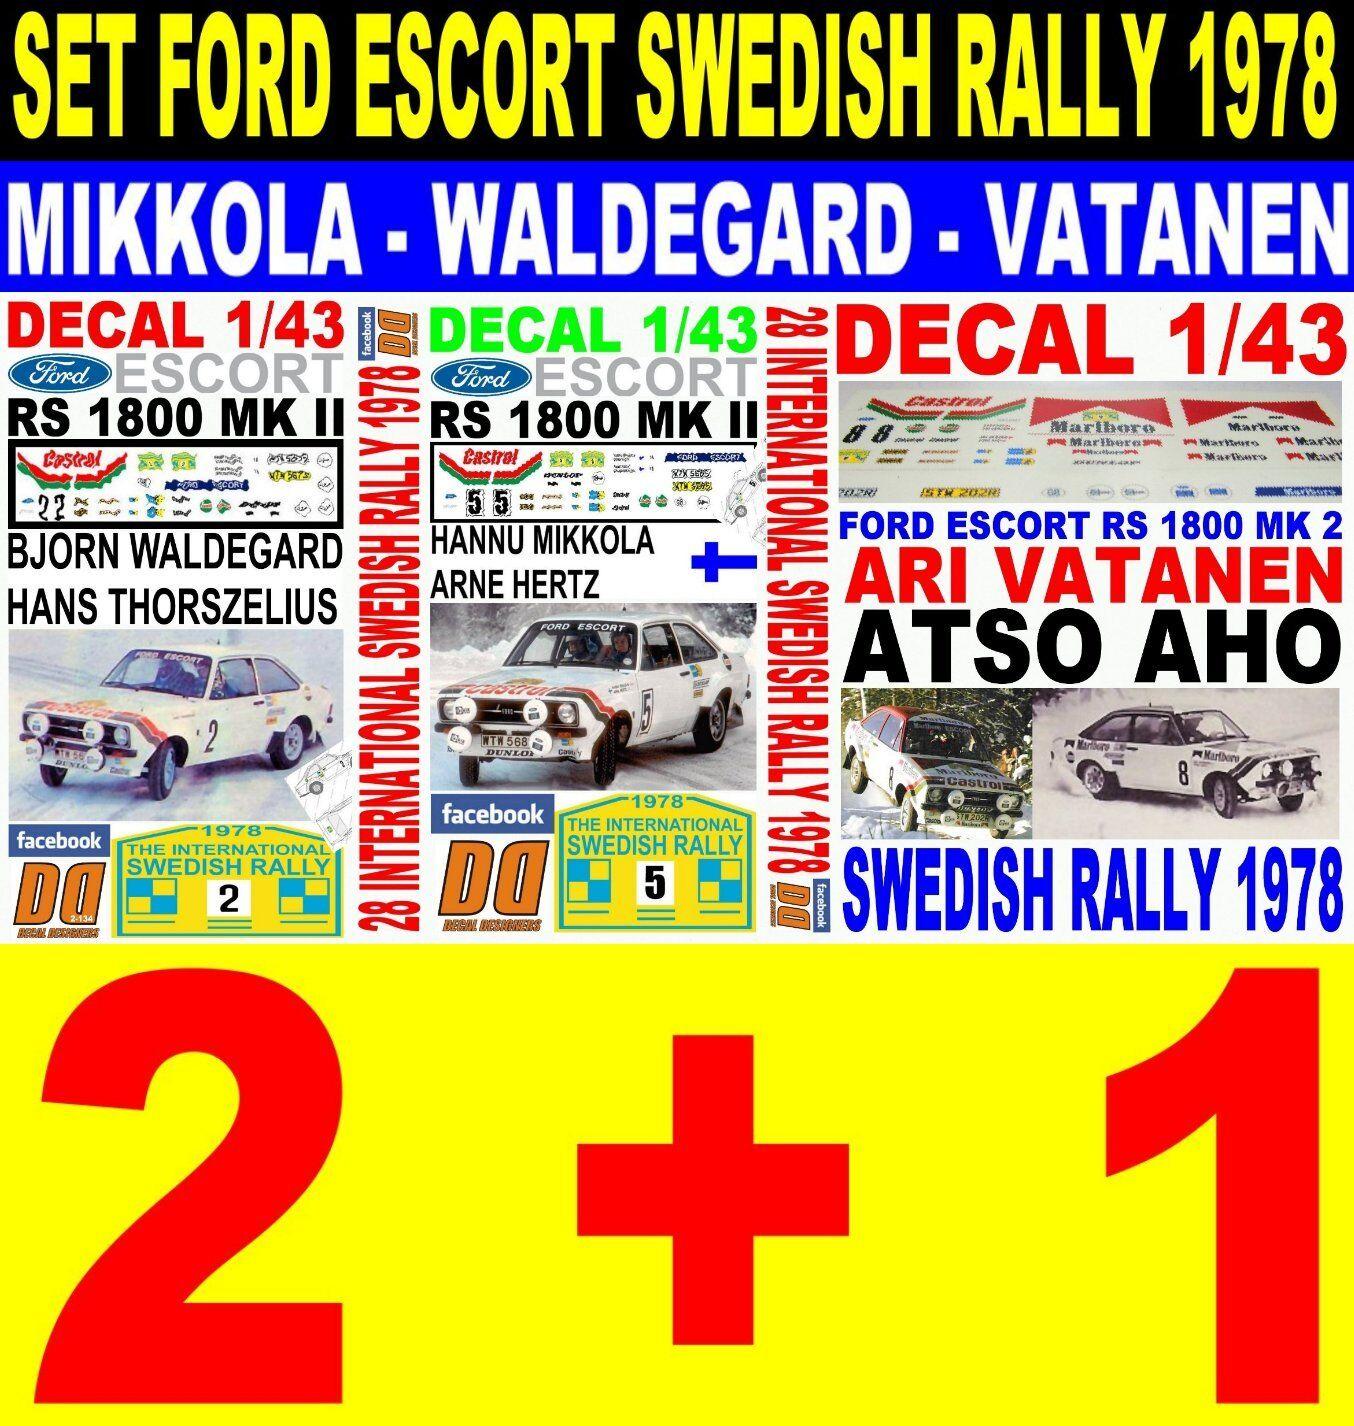 DECAL 1 43 SET SET SET FORD ESCORT SWEDISH RALLY 1978 - MIKKOLA -  WALDEGARD - VATA (07) 53ddfa